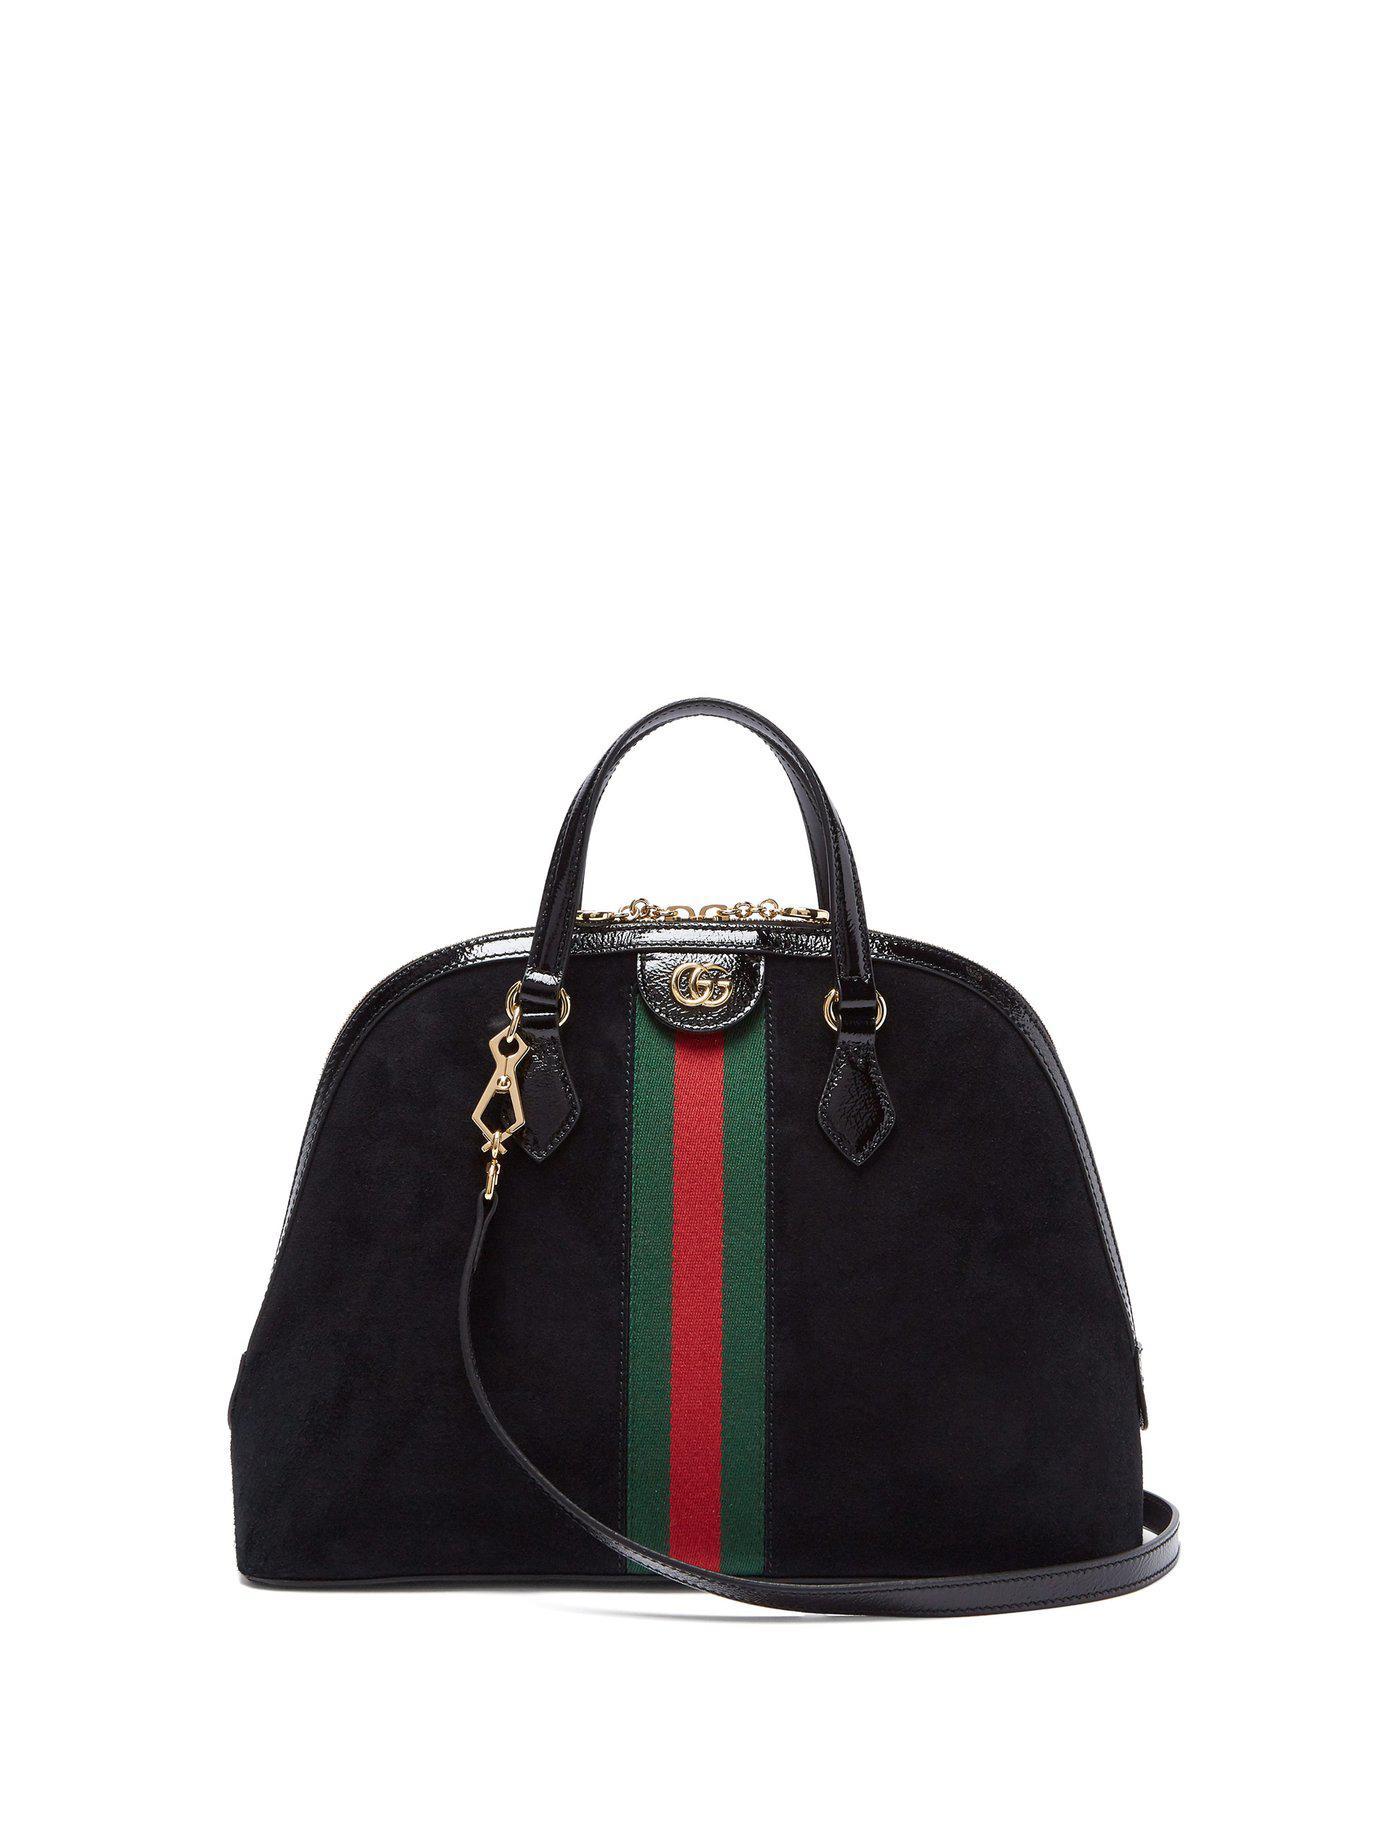 8f8095e14970 Gucci. Women s Black Ophidia Medium Top Handle Bag